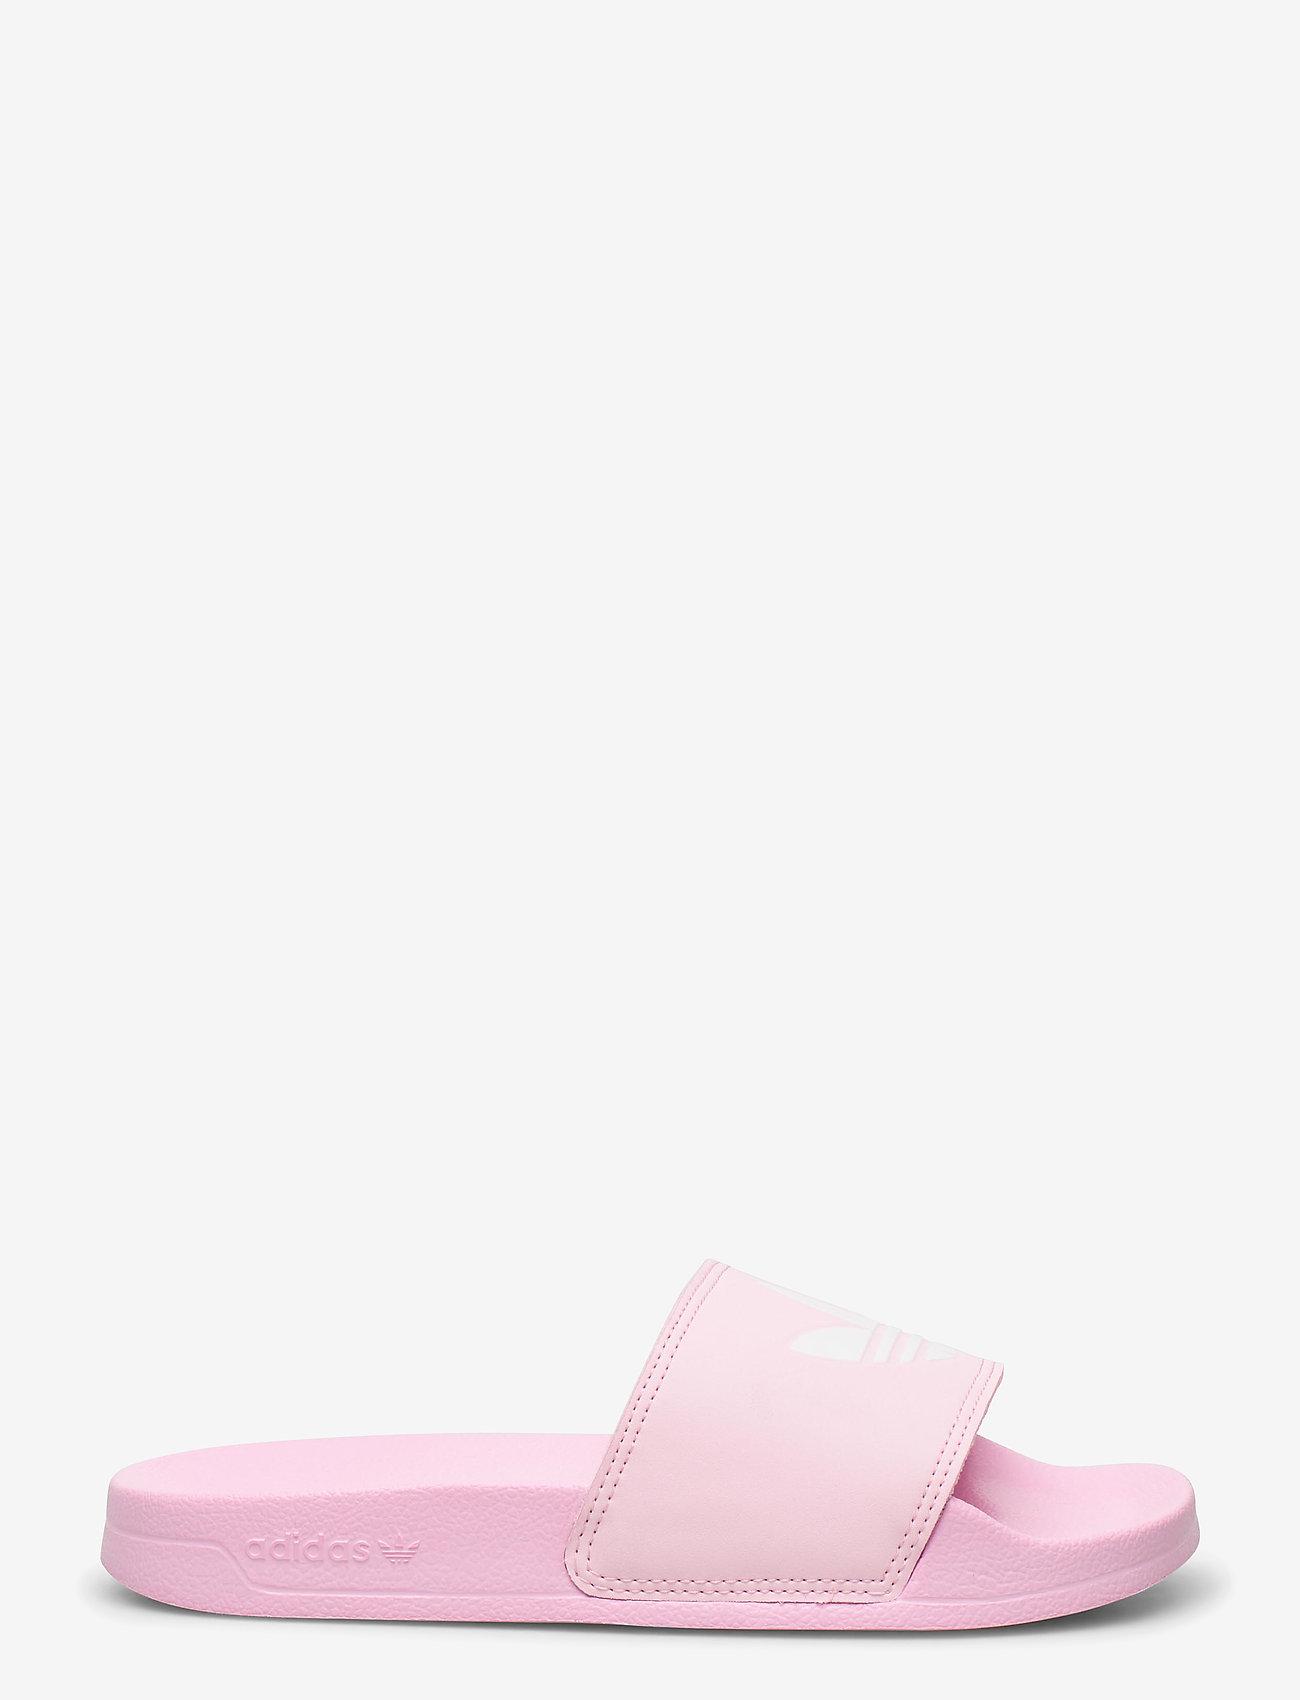 adidas Originals - ADILETTE LITE W - tennarit - trupnk/ftwwht/trupnk - 1